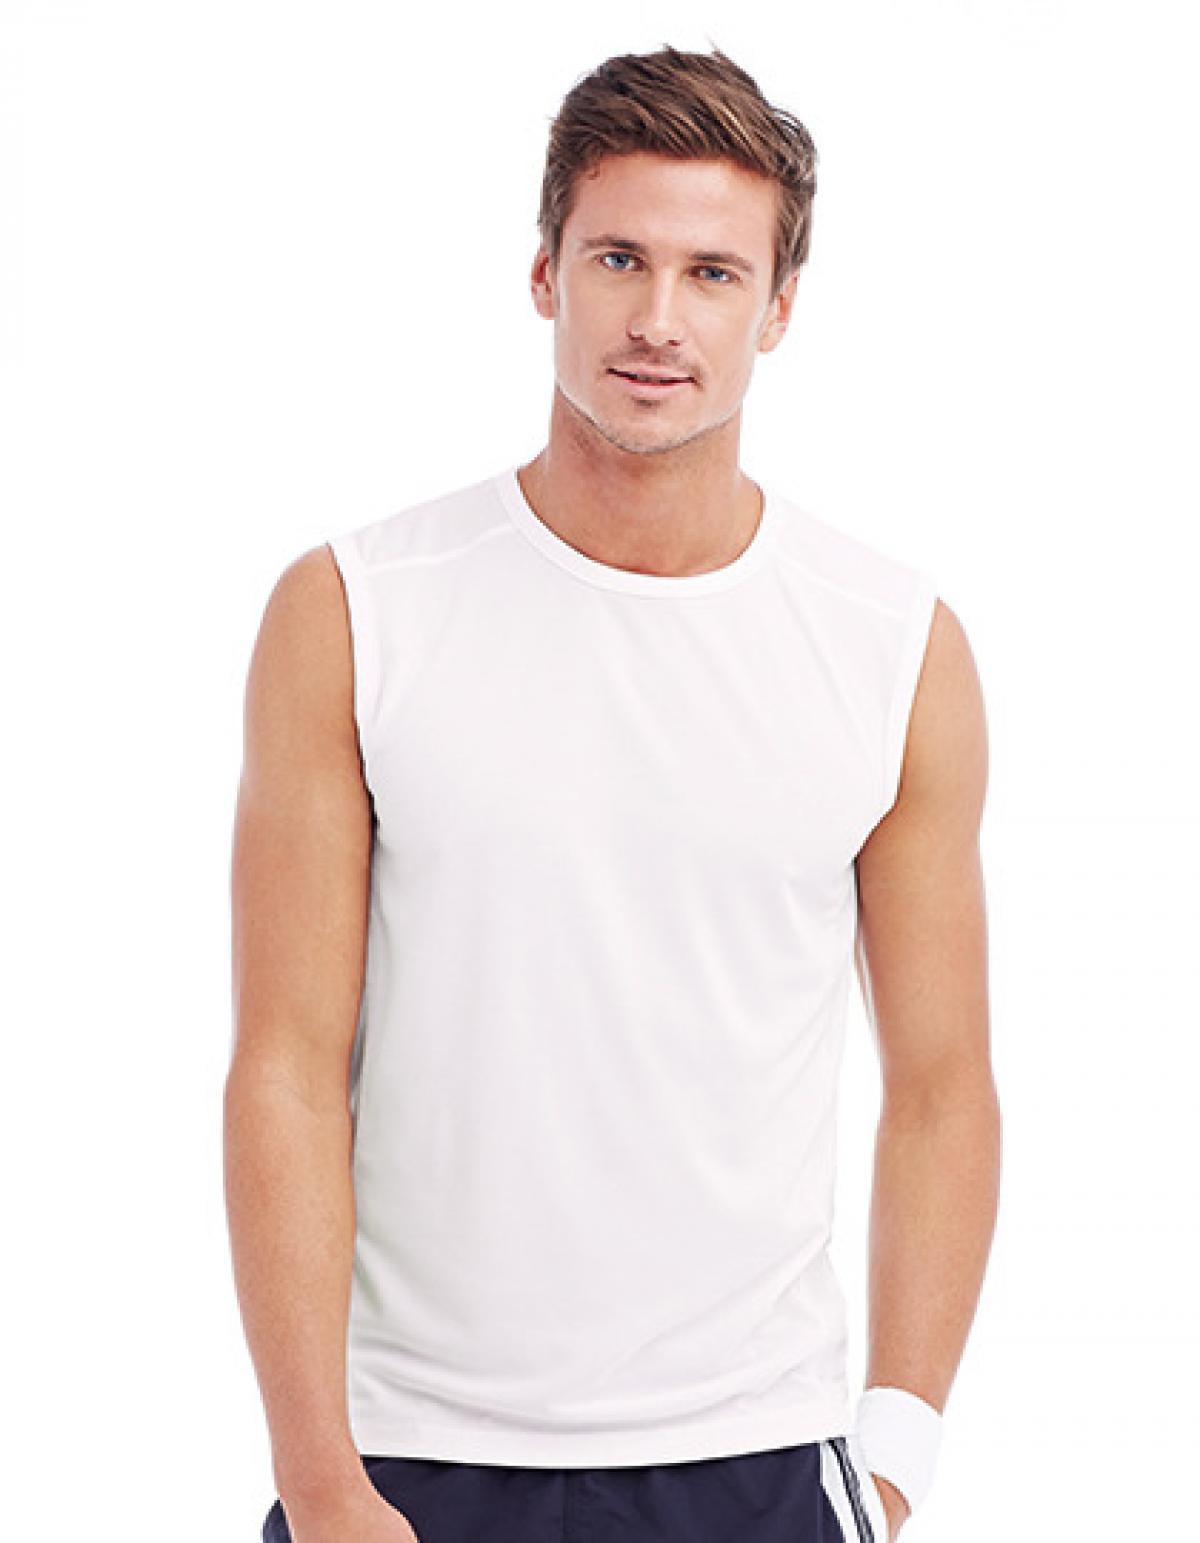 active 140 sleeveless tank top sport t shirt rexlander s. Black Bedroom Furniture Sets. Home Design Ideas